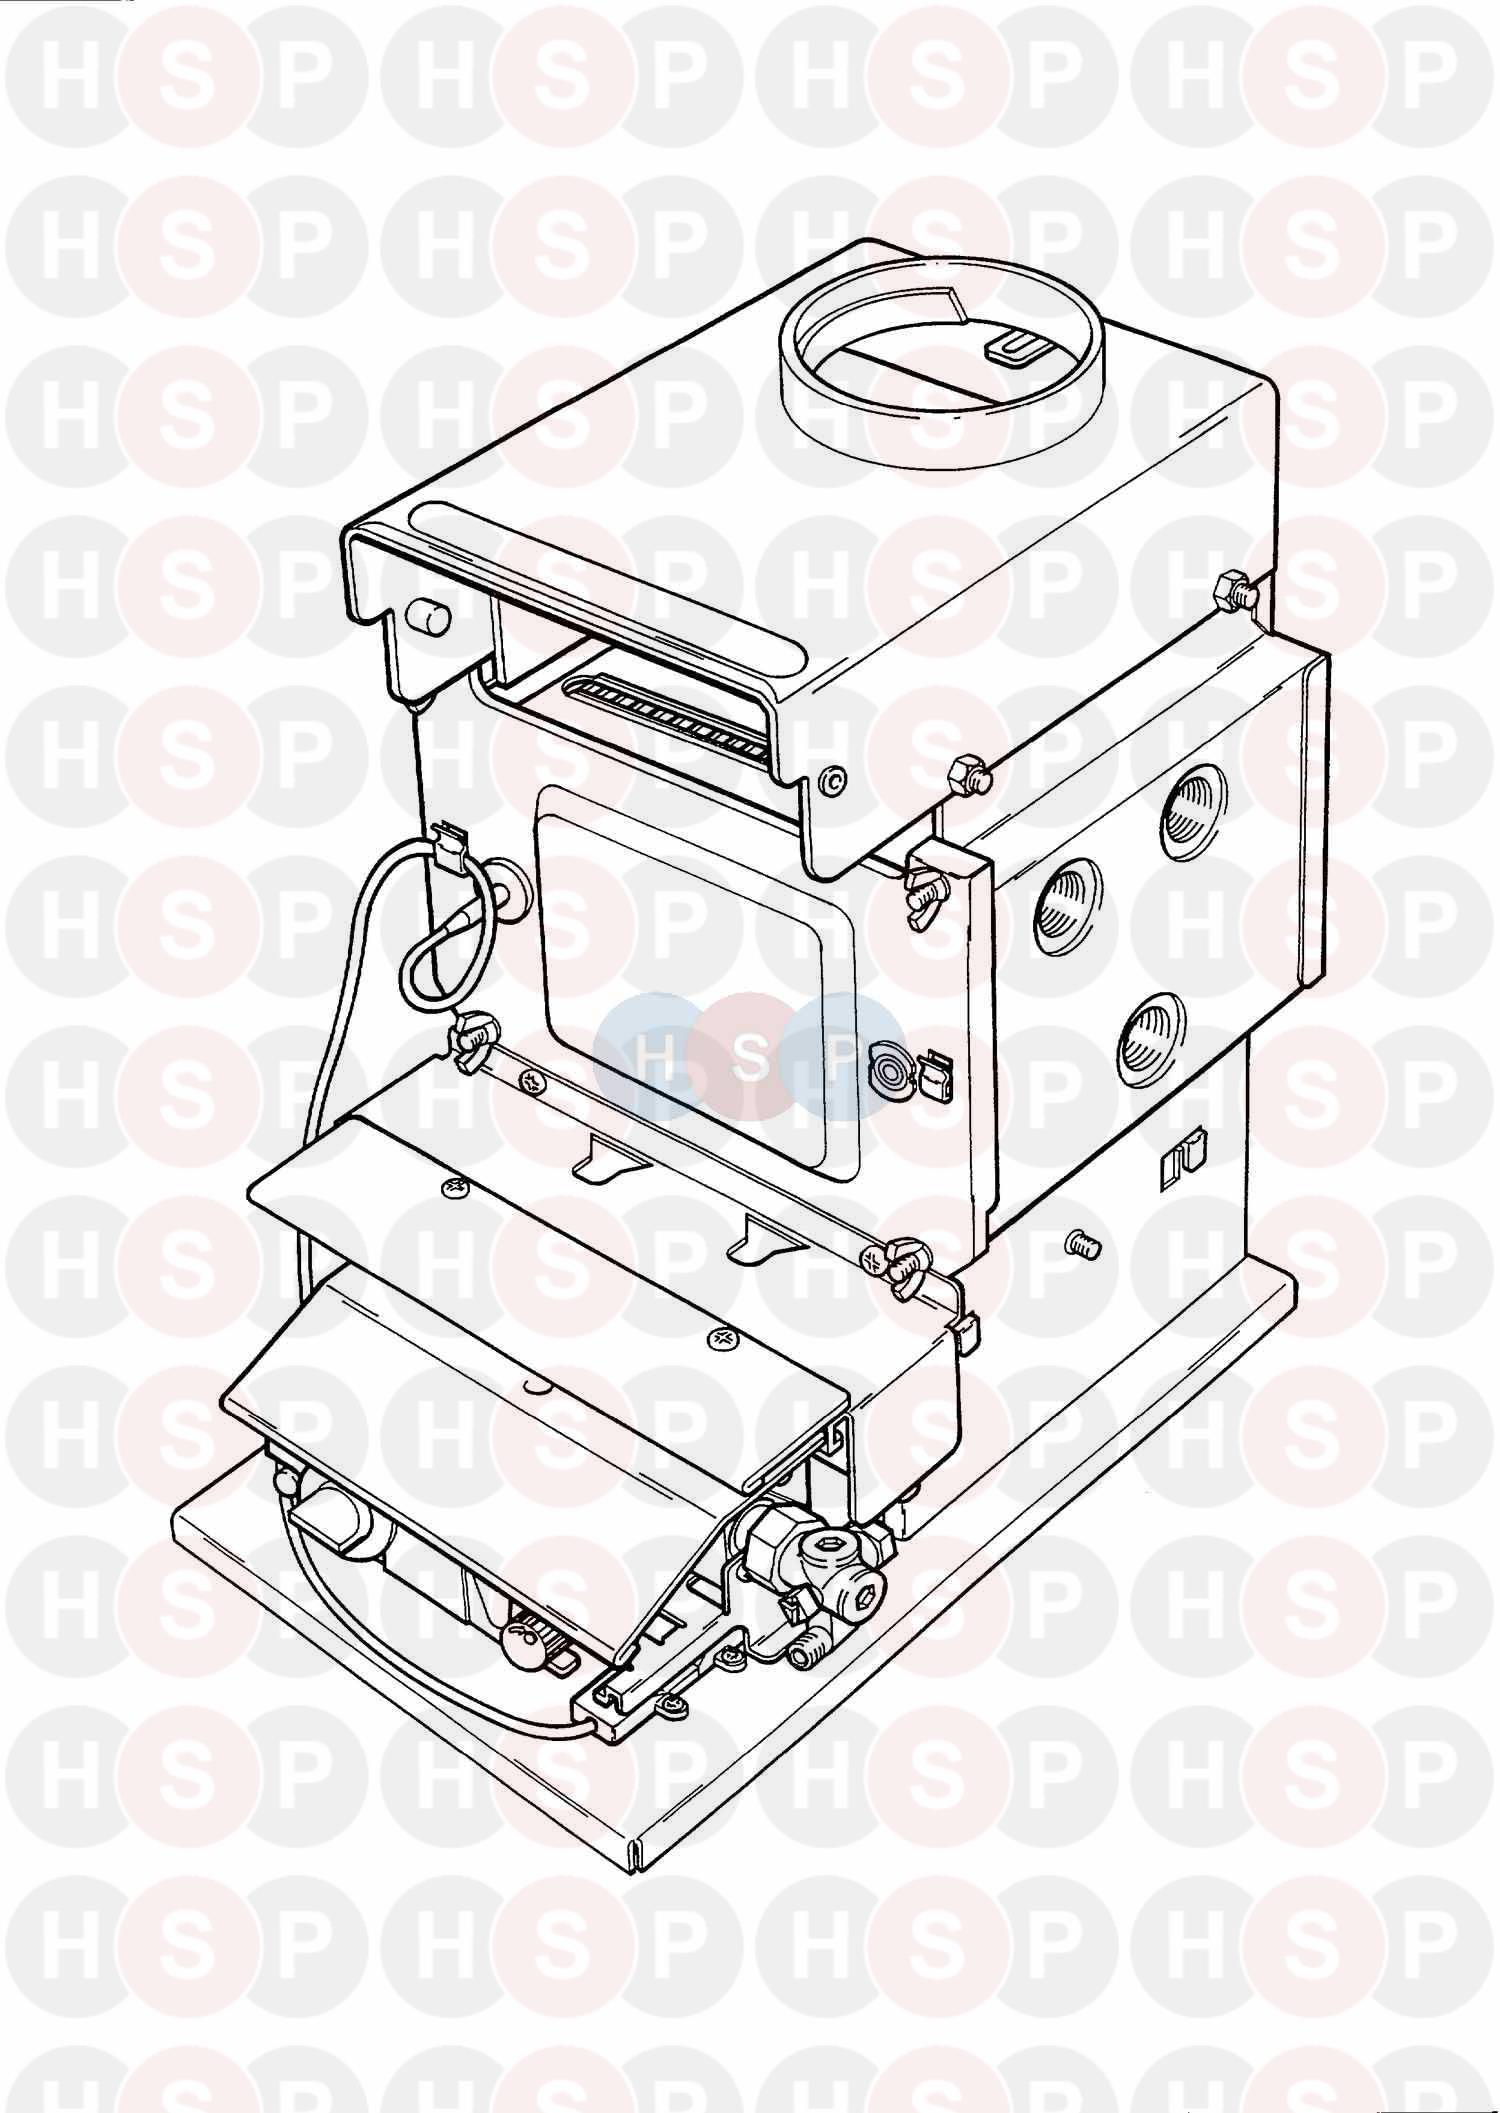 Baxi BERMUDA 57/3 M Appliance Diagram (Appliance overview